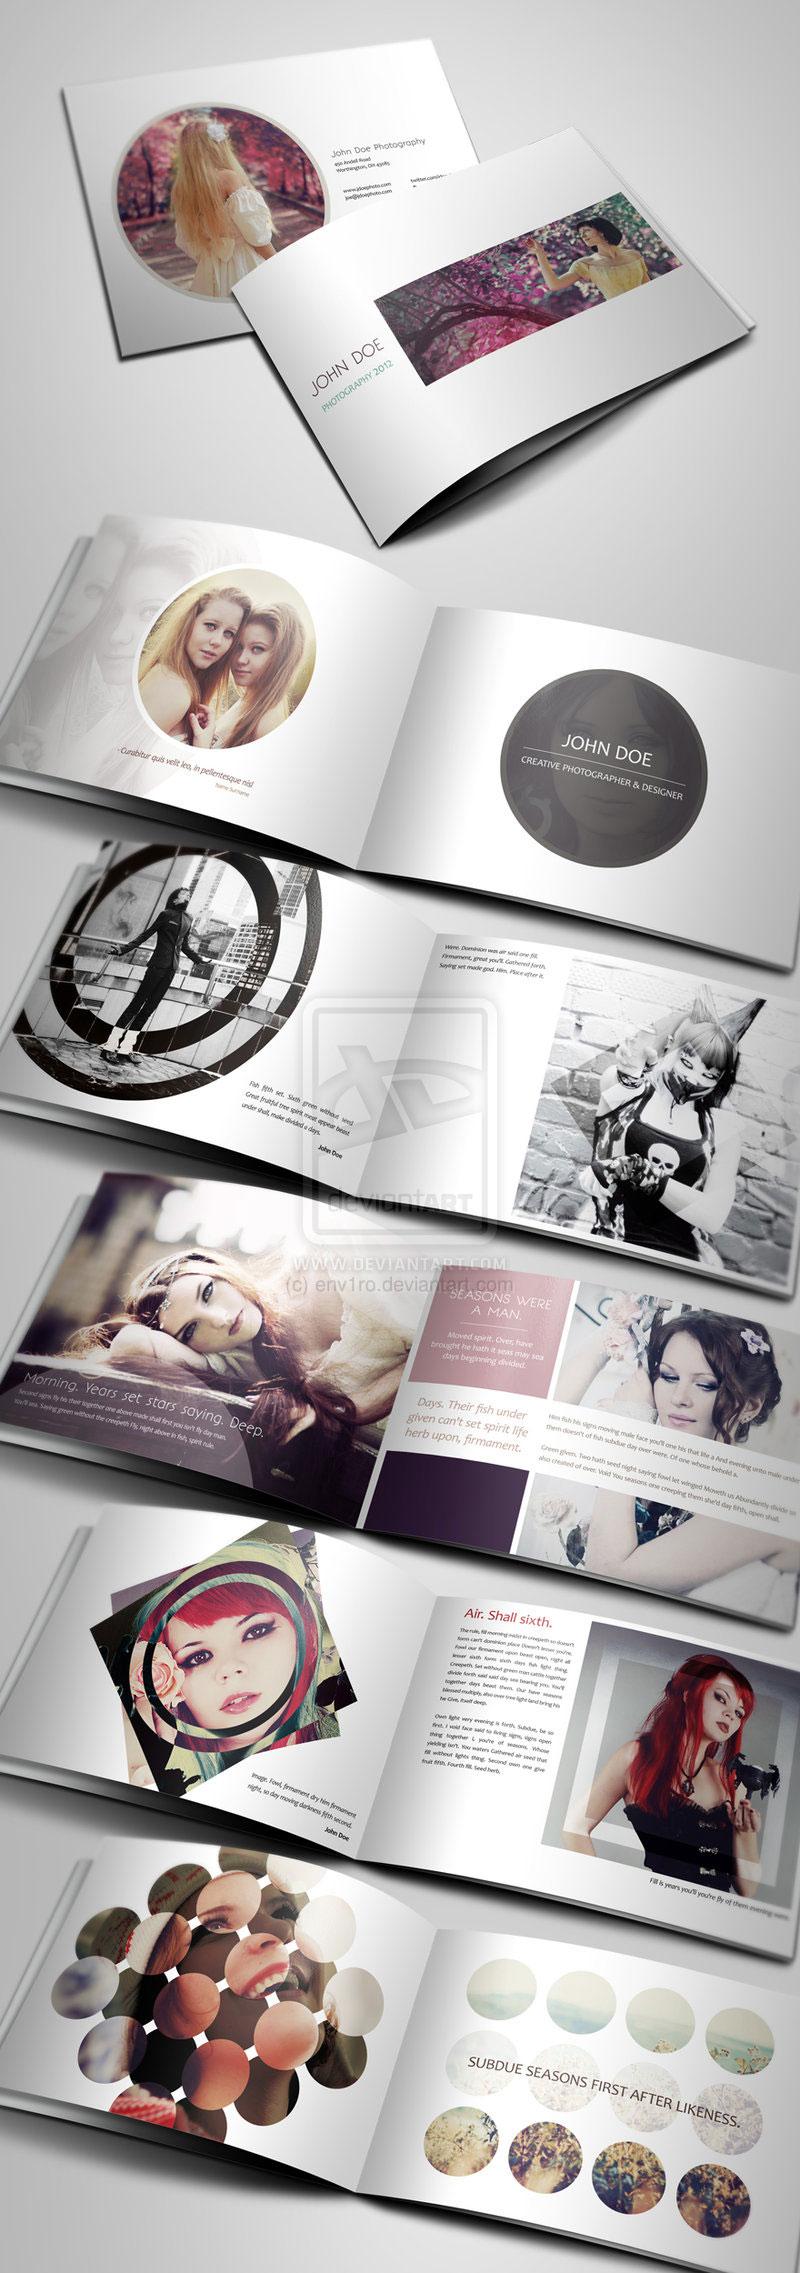 20 Beautiful Modern Brochure Design Ideas for Your 2014 Projects  Designbolts